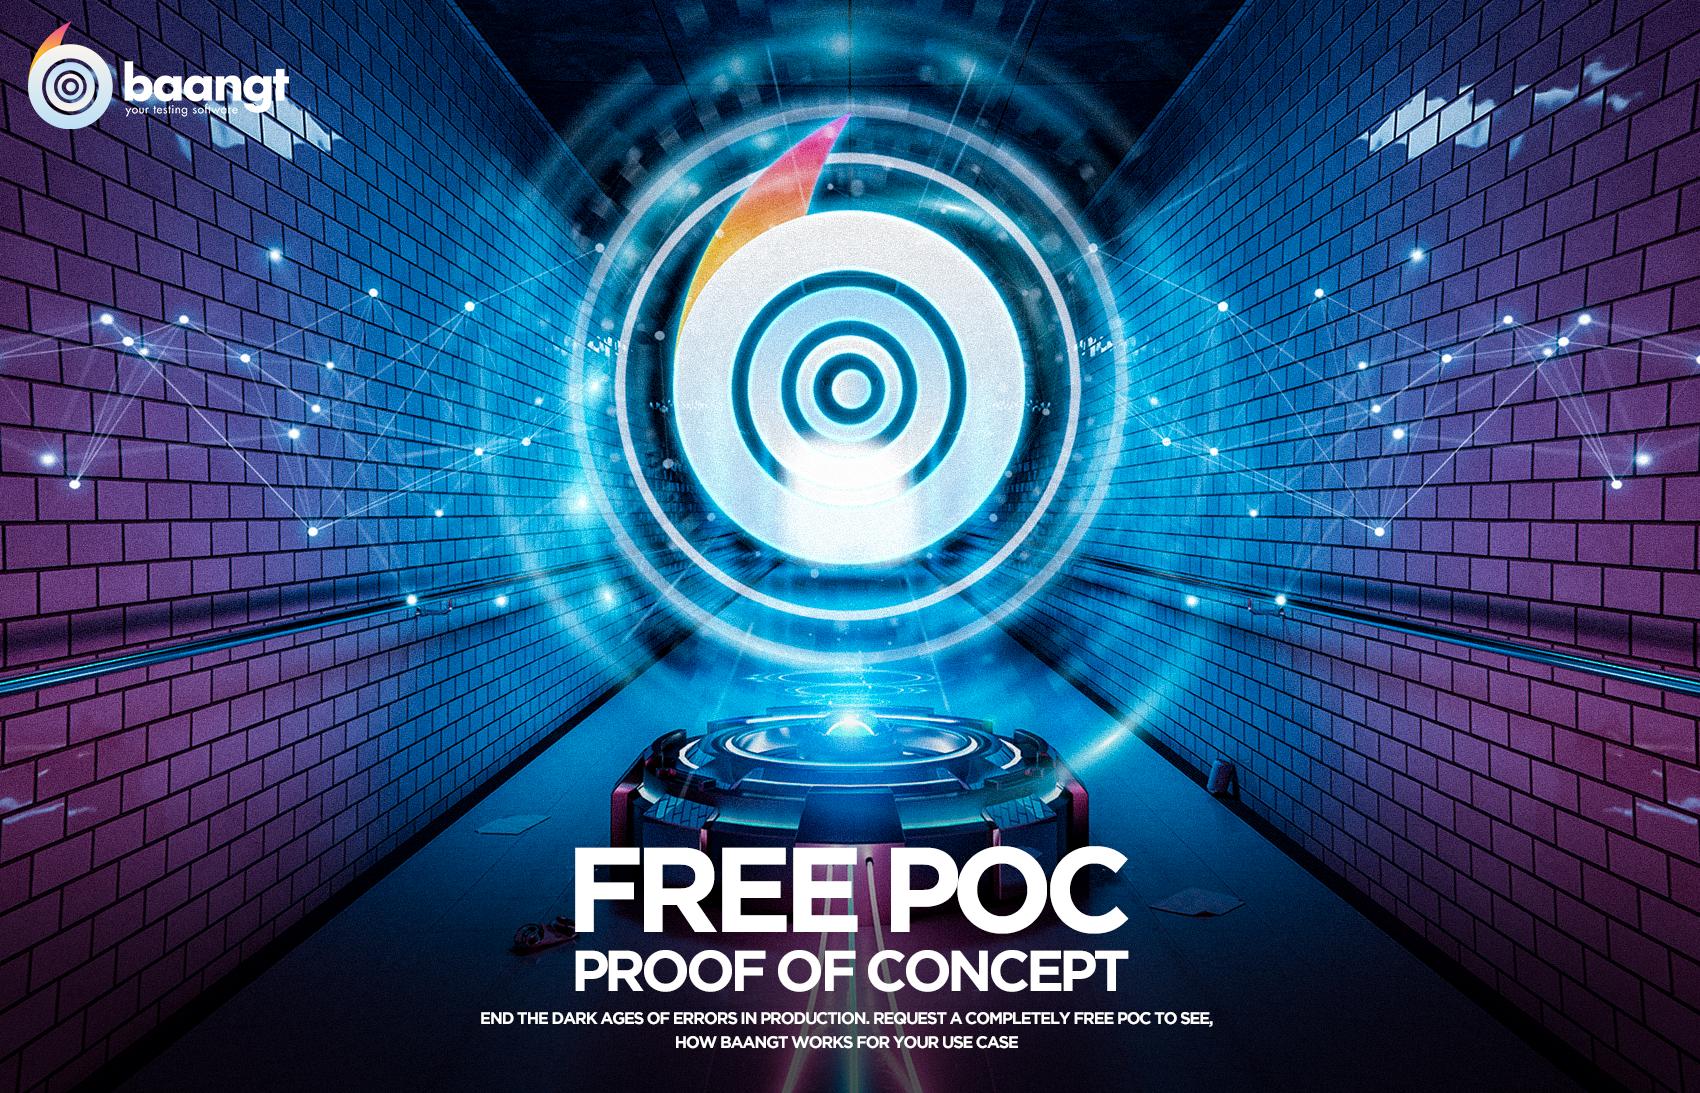 Weekly free POC